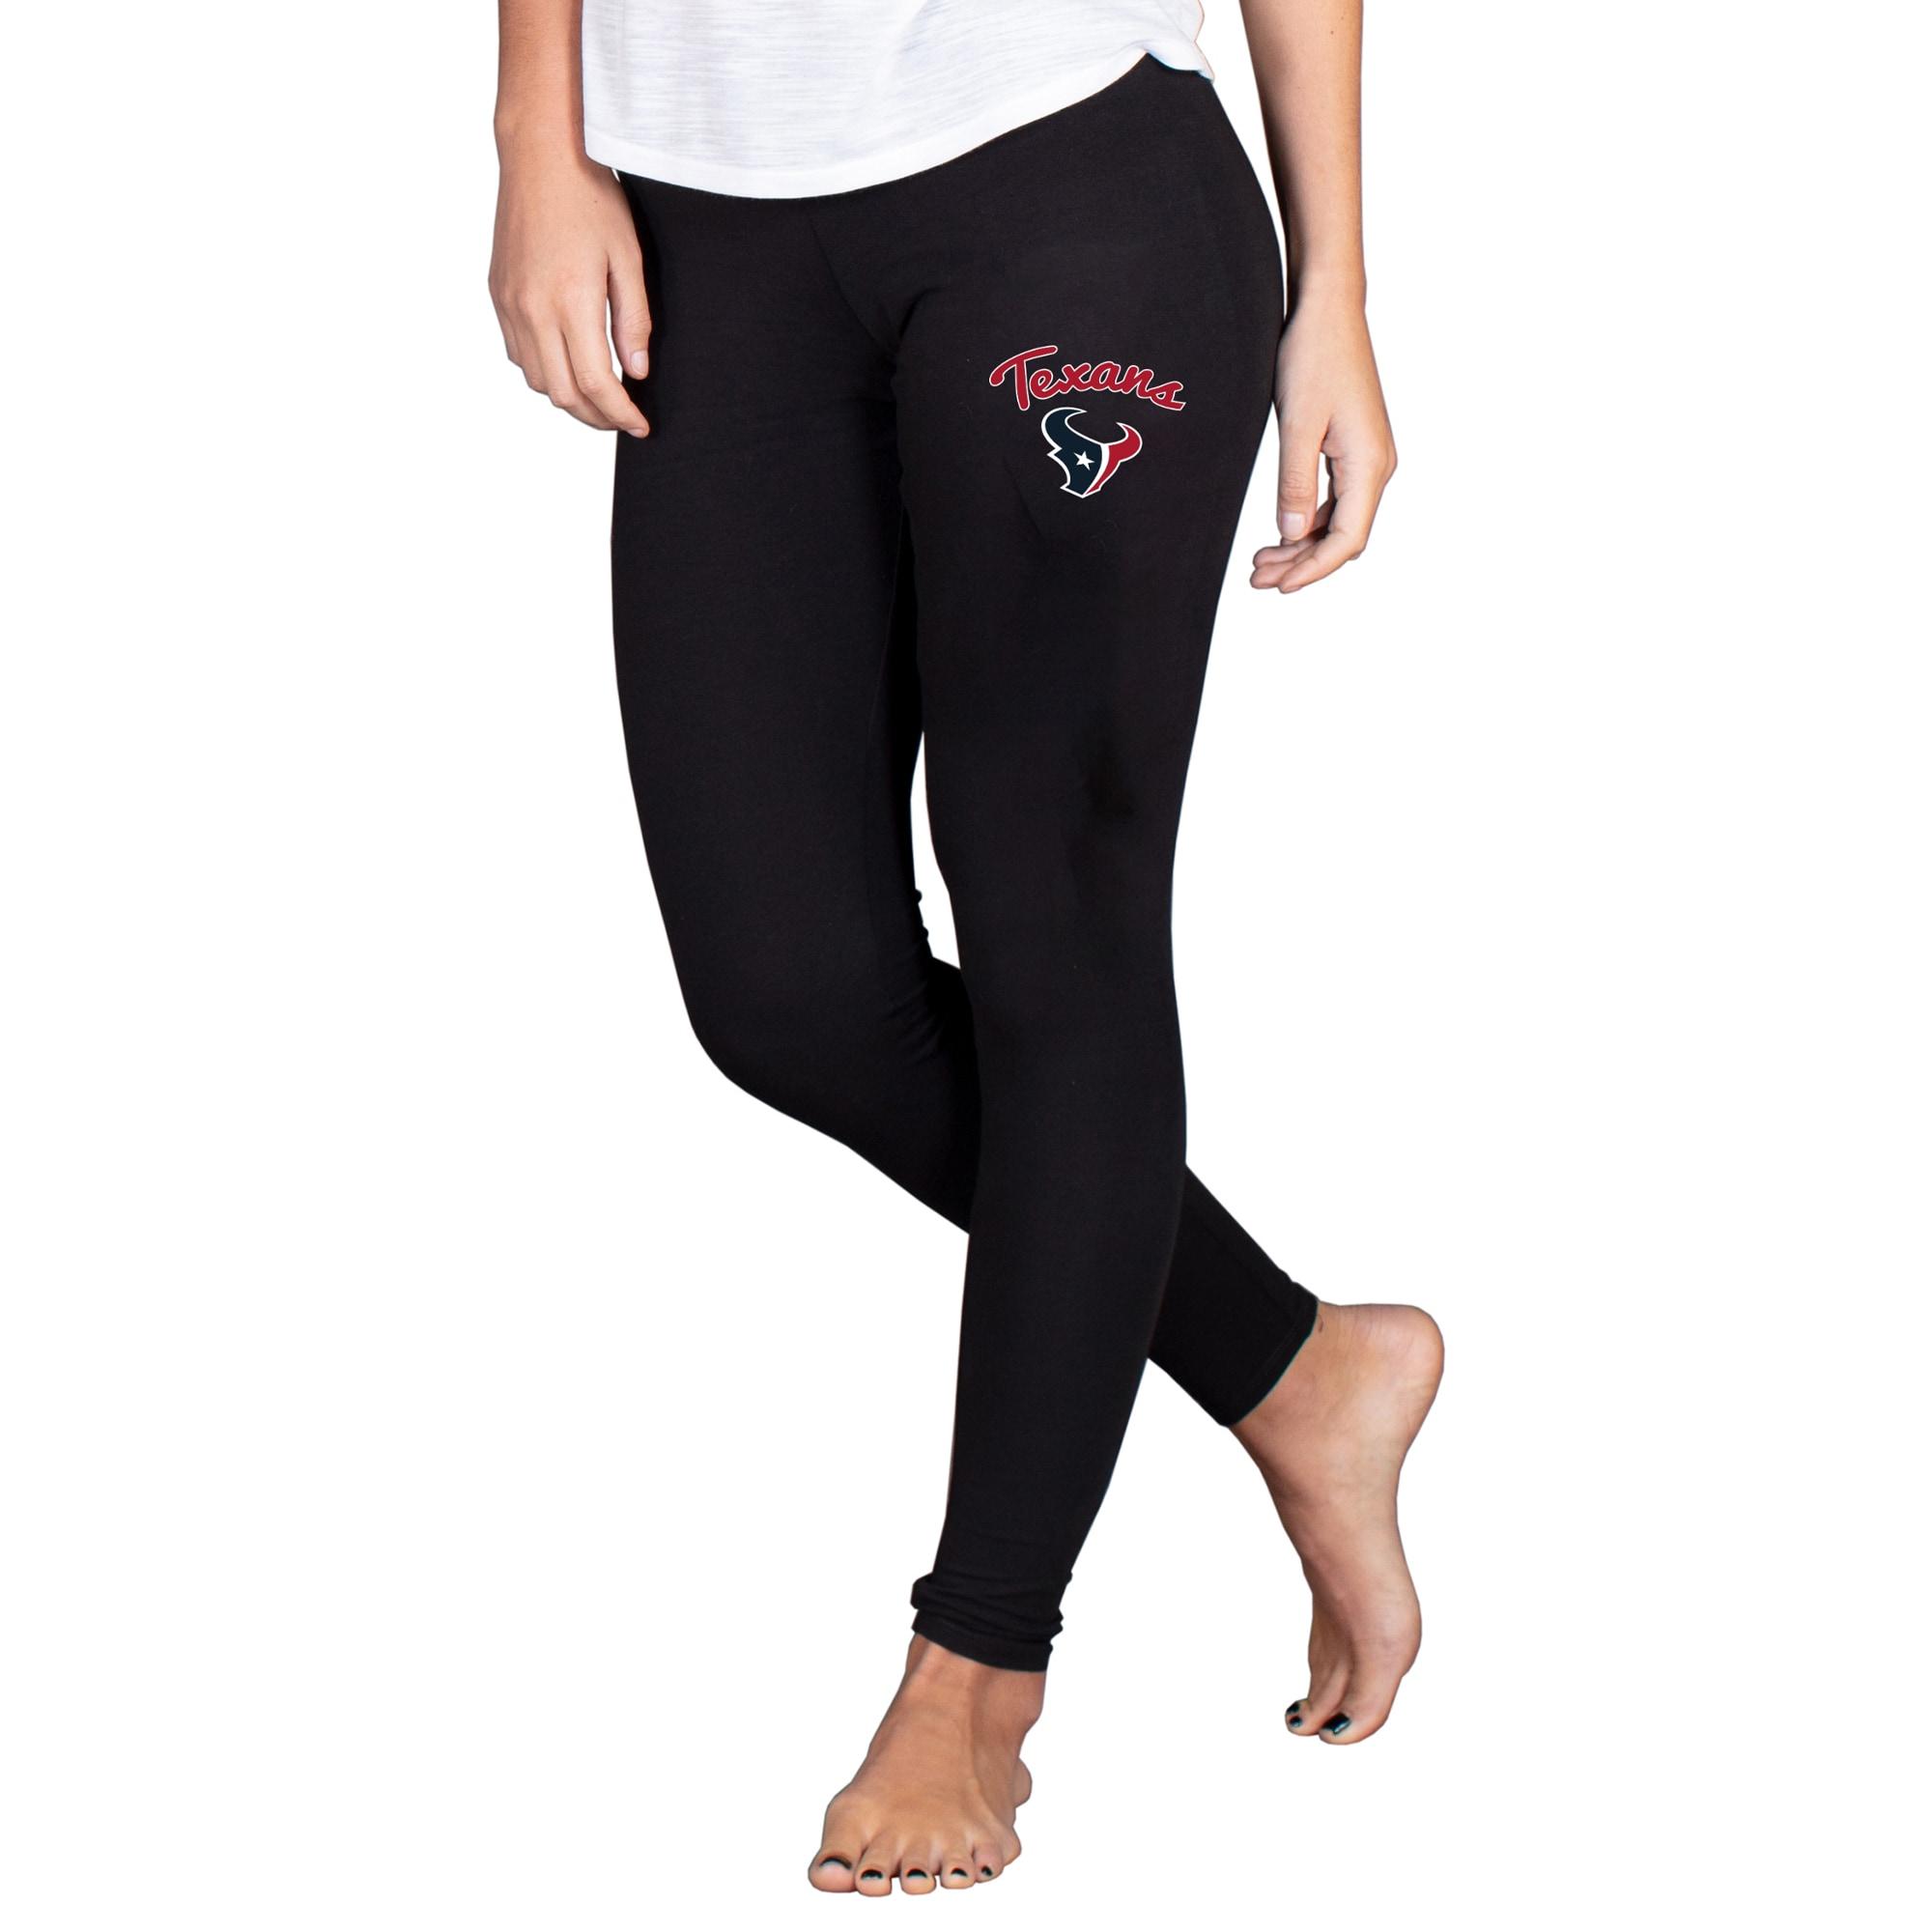 Houston Texans Concepts Sport Women's Fraction Leggings - Black